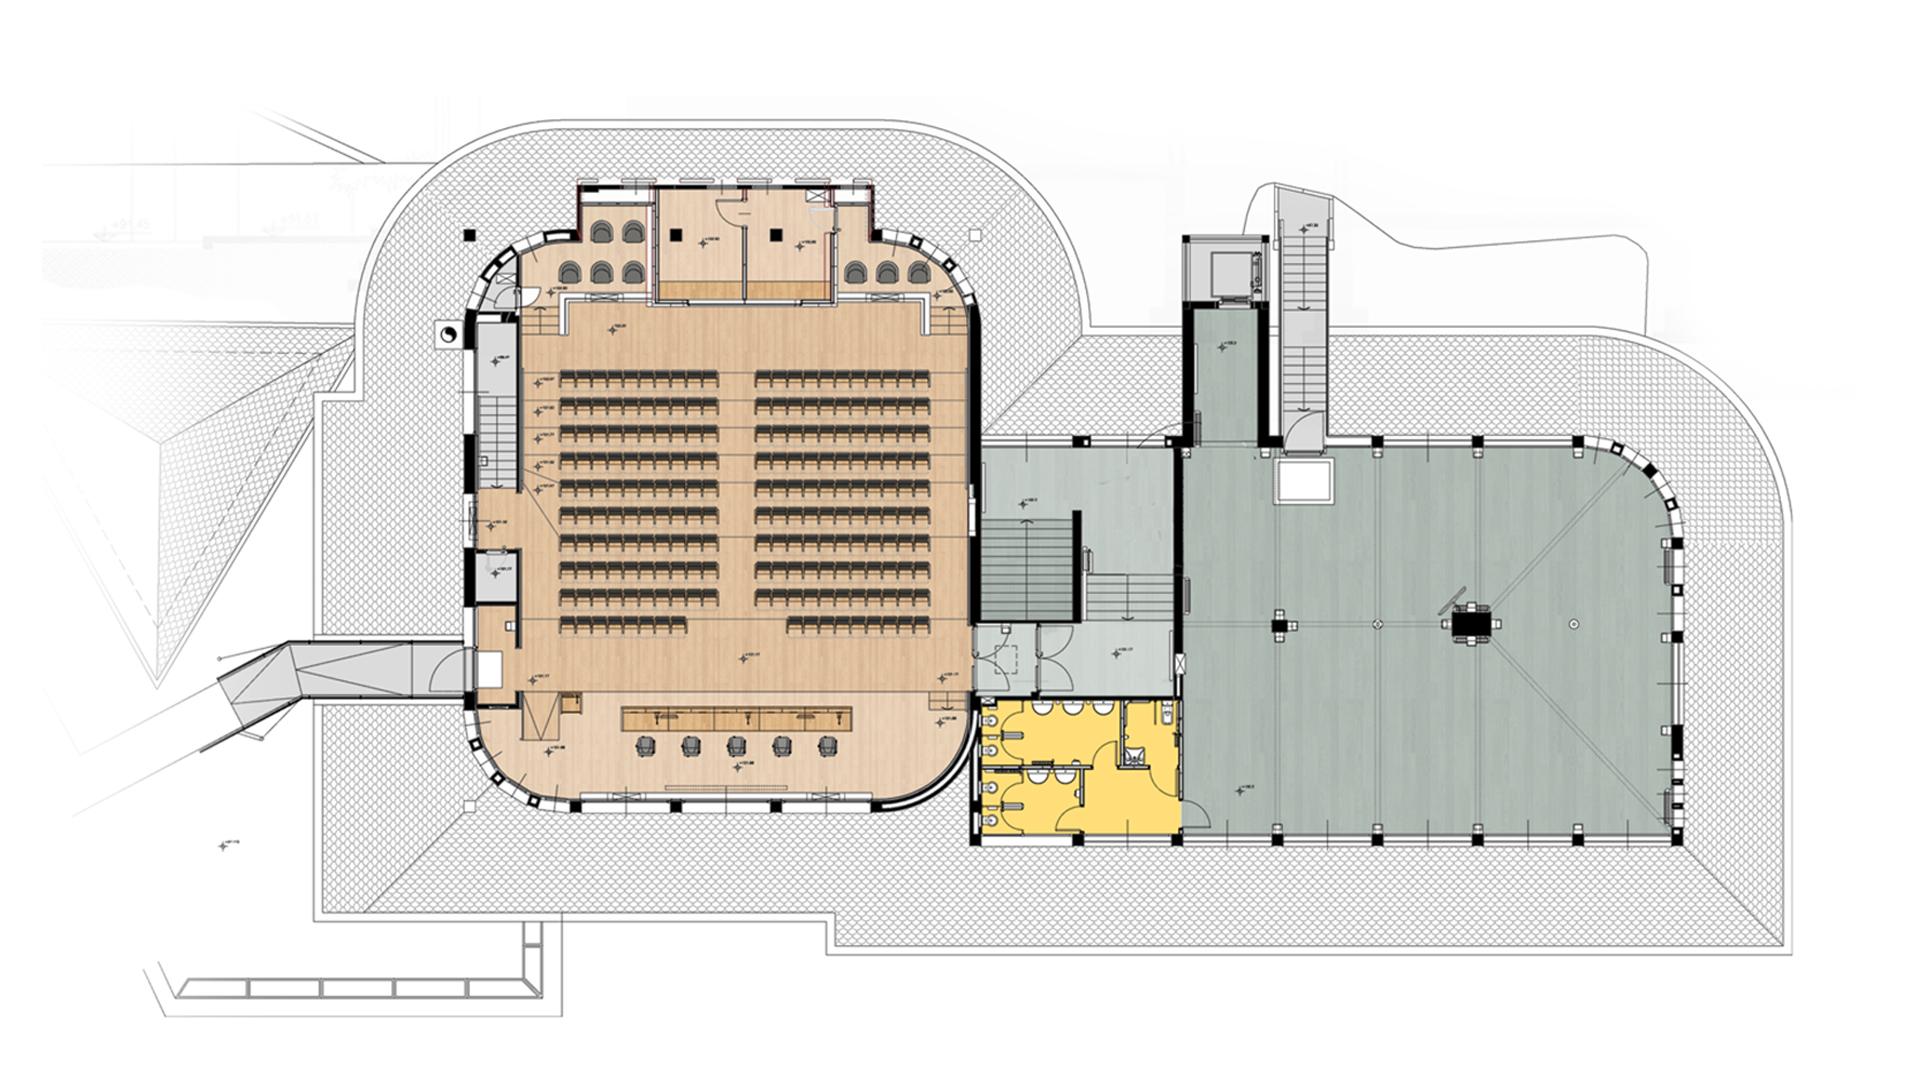 archiloco-courmayeur-allestimenti-interni-arredo-sala-conferenze-planimetria-2